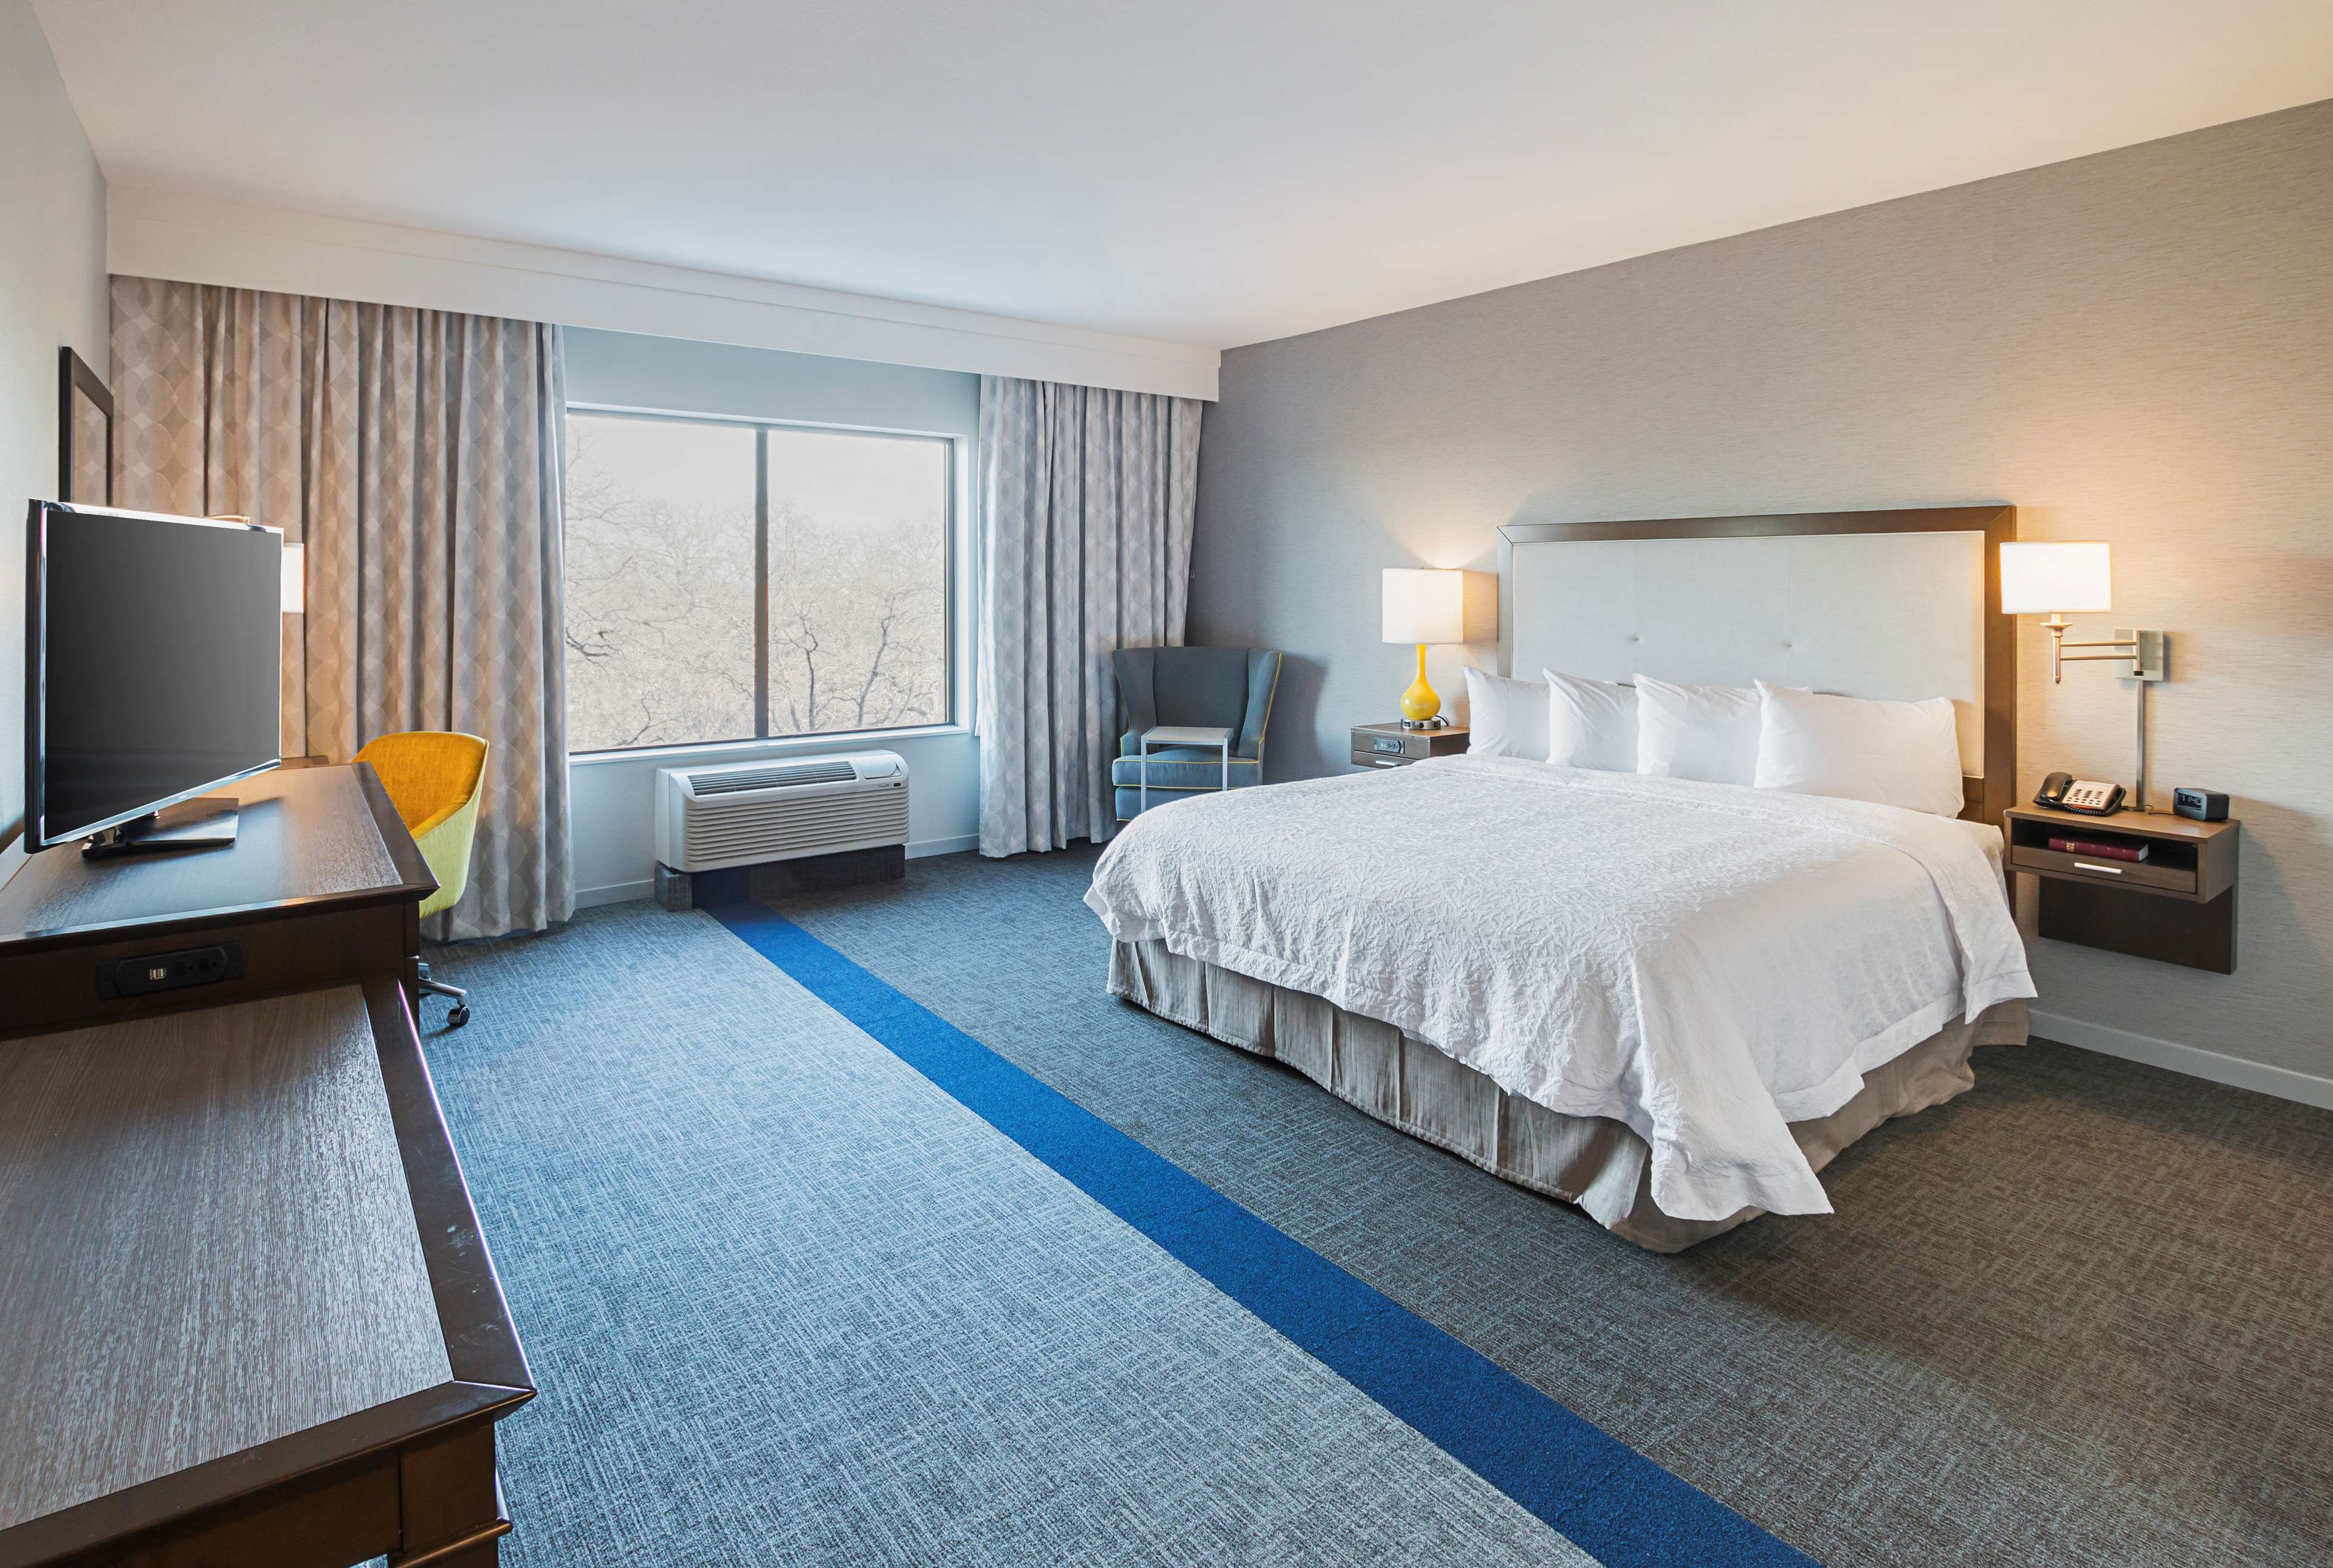 Hampton Inn & Suites Colleyville DFW West image 46